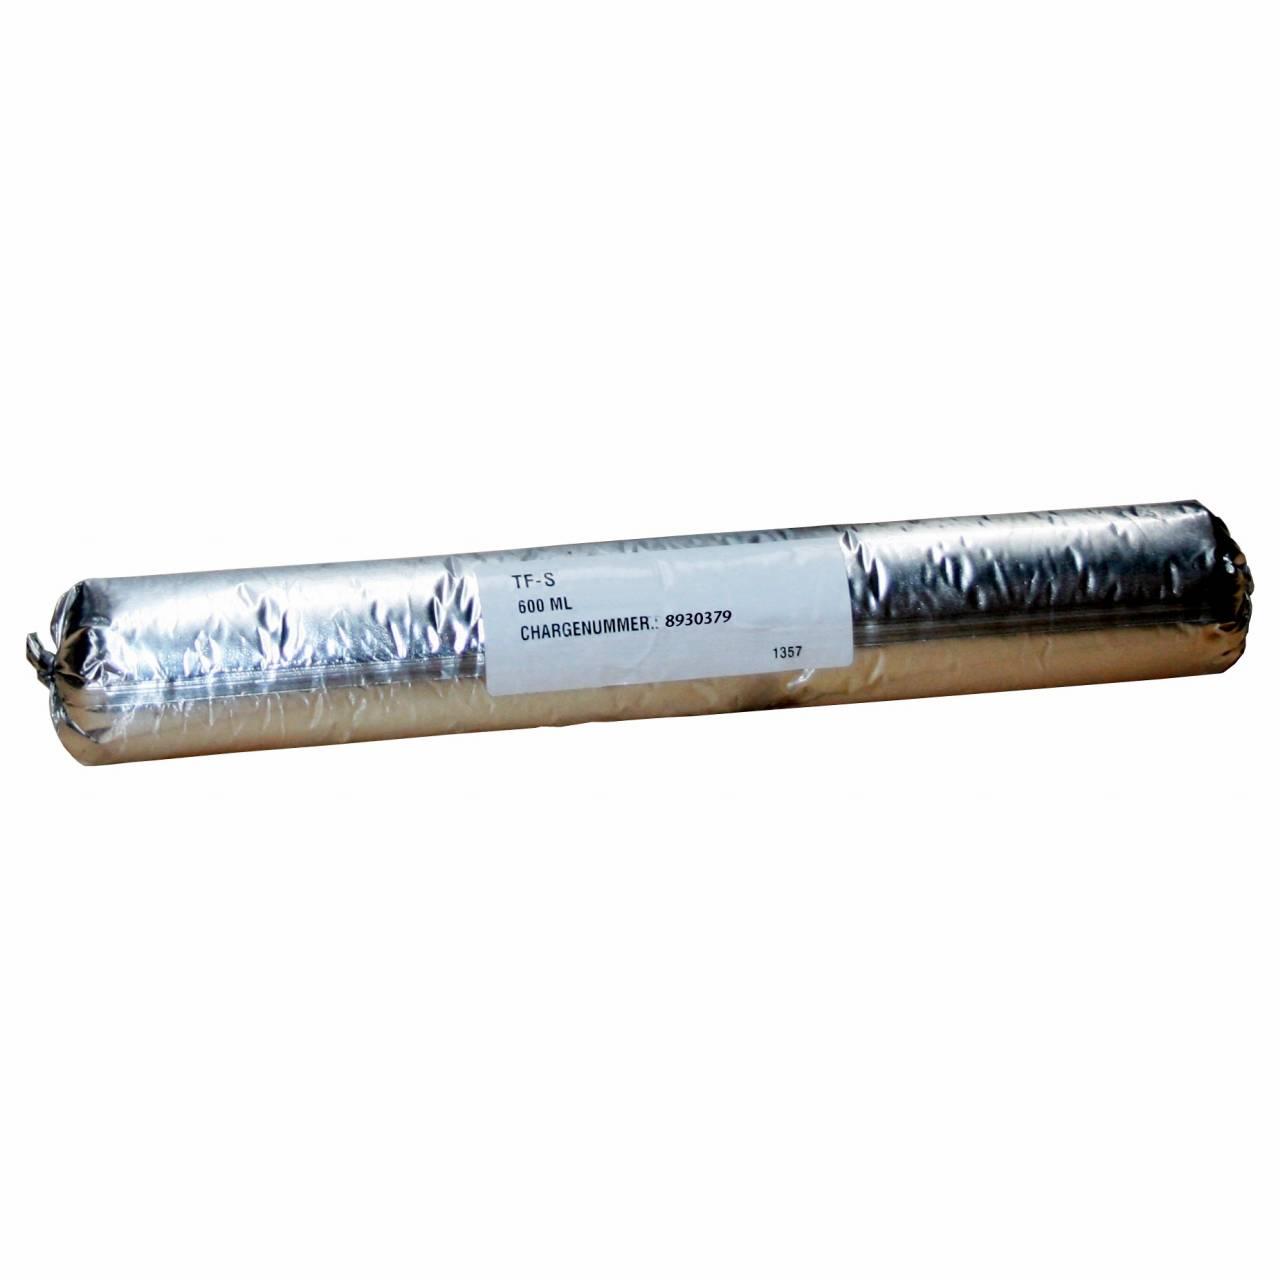 Winflex-Tfs® Klebedichtstoff 600 ml / Krt a 20 Beutel